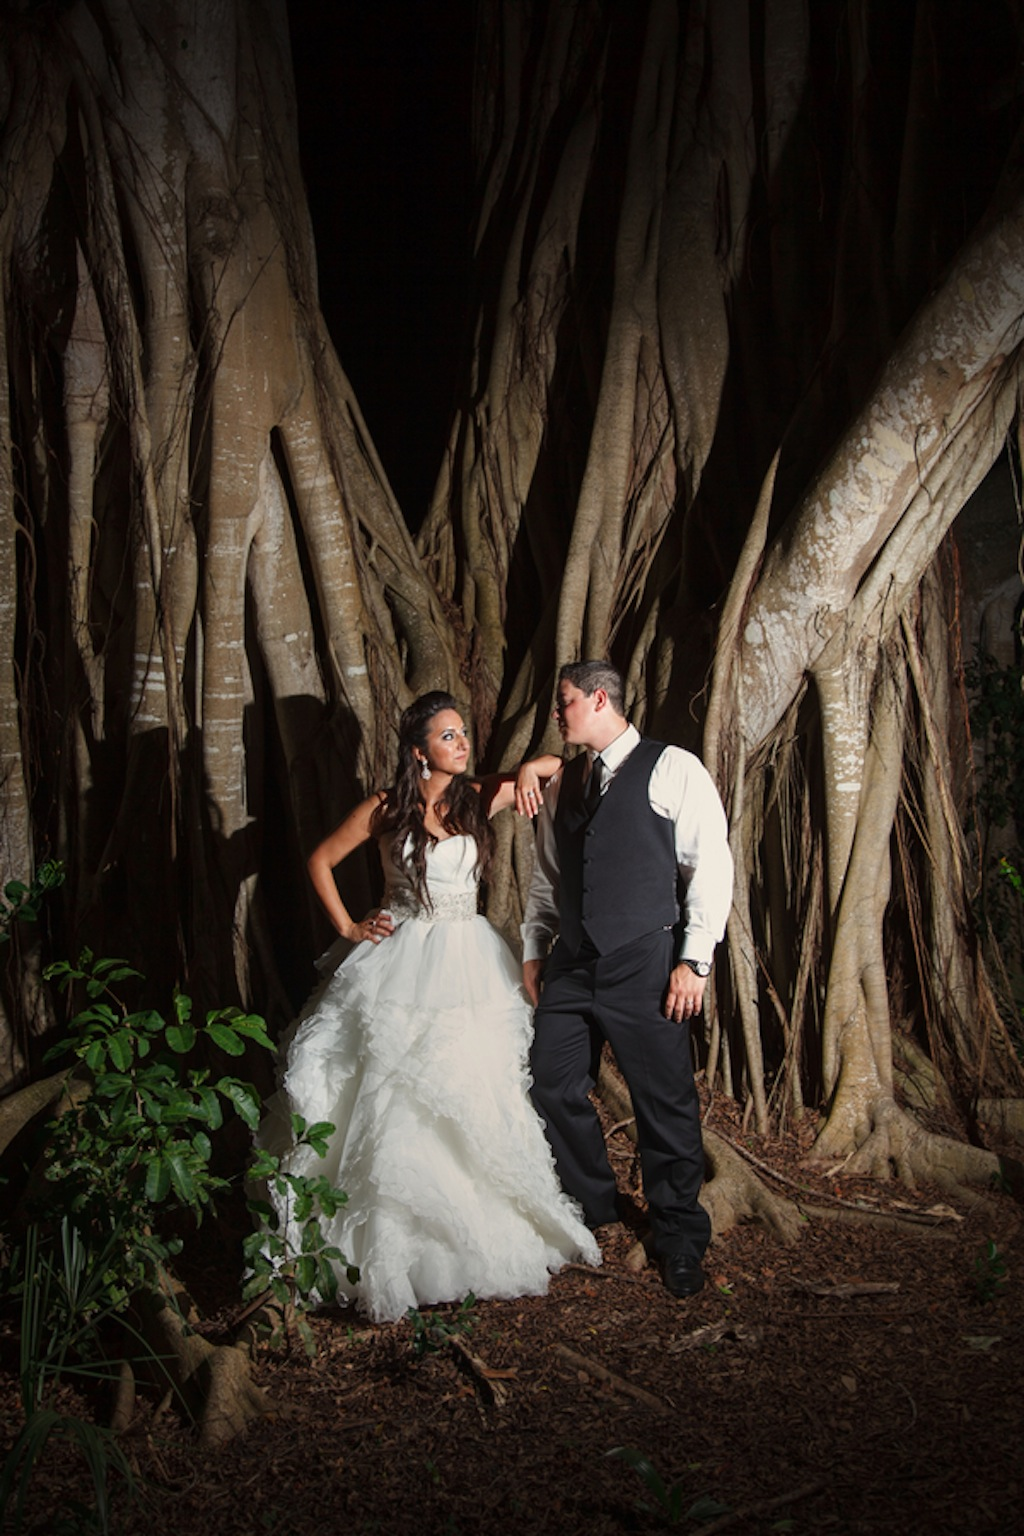 Powel Crosley Florida Waterfront Destination Wedding - Carrie Wildes Photography